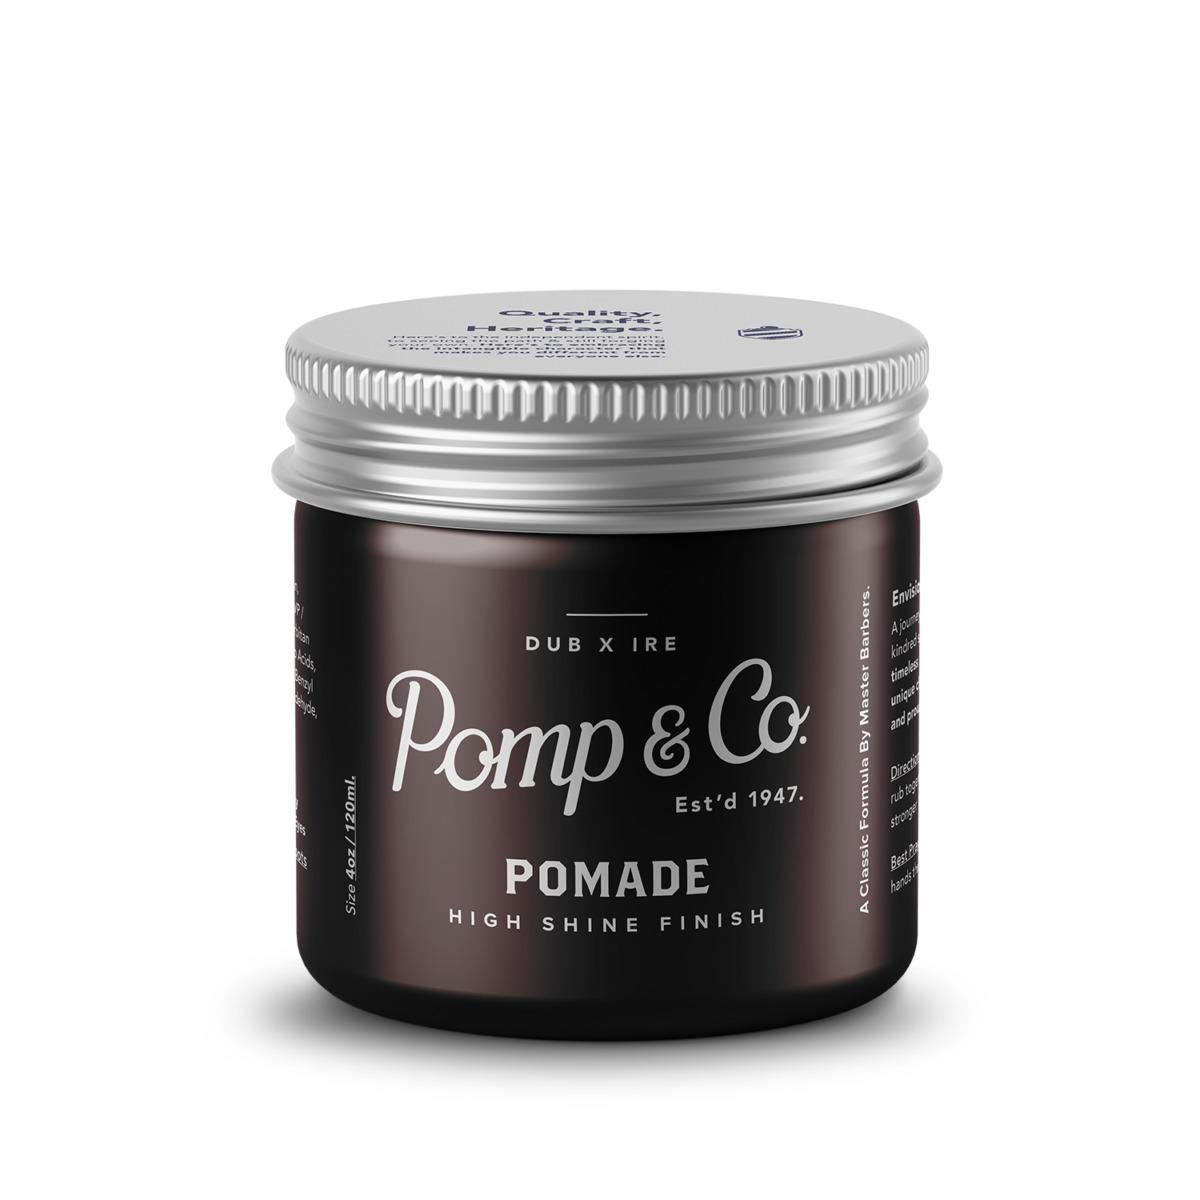 Tuotekuva: Pomp&Co. Pomade (120ml)